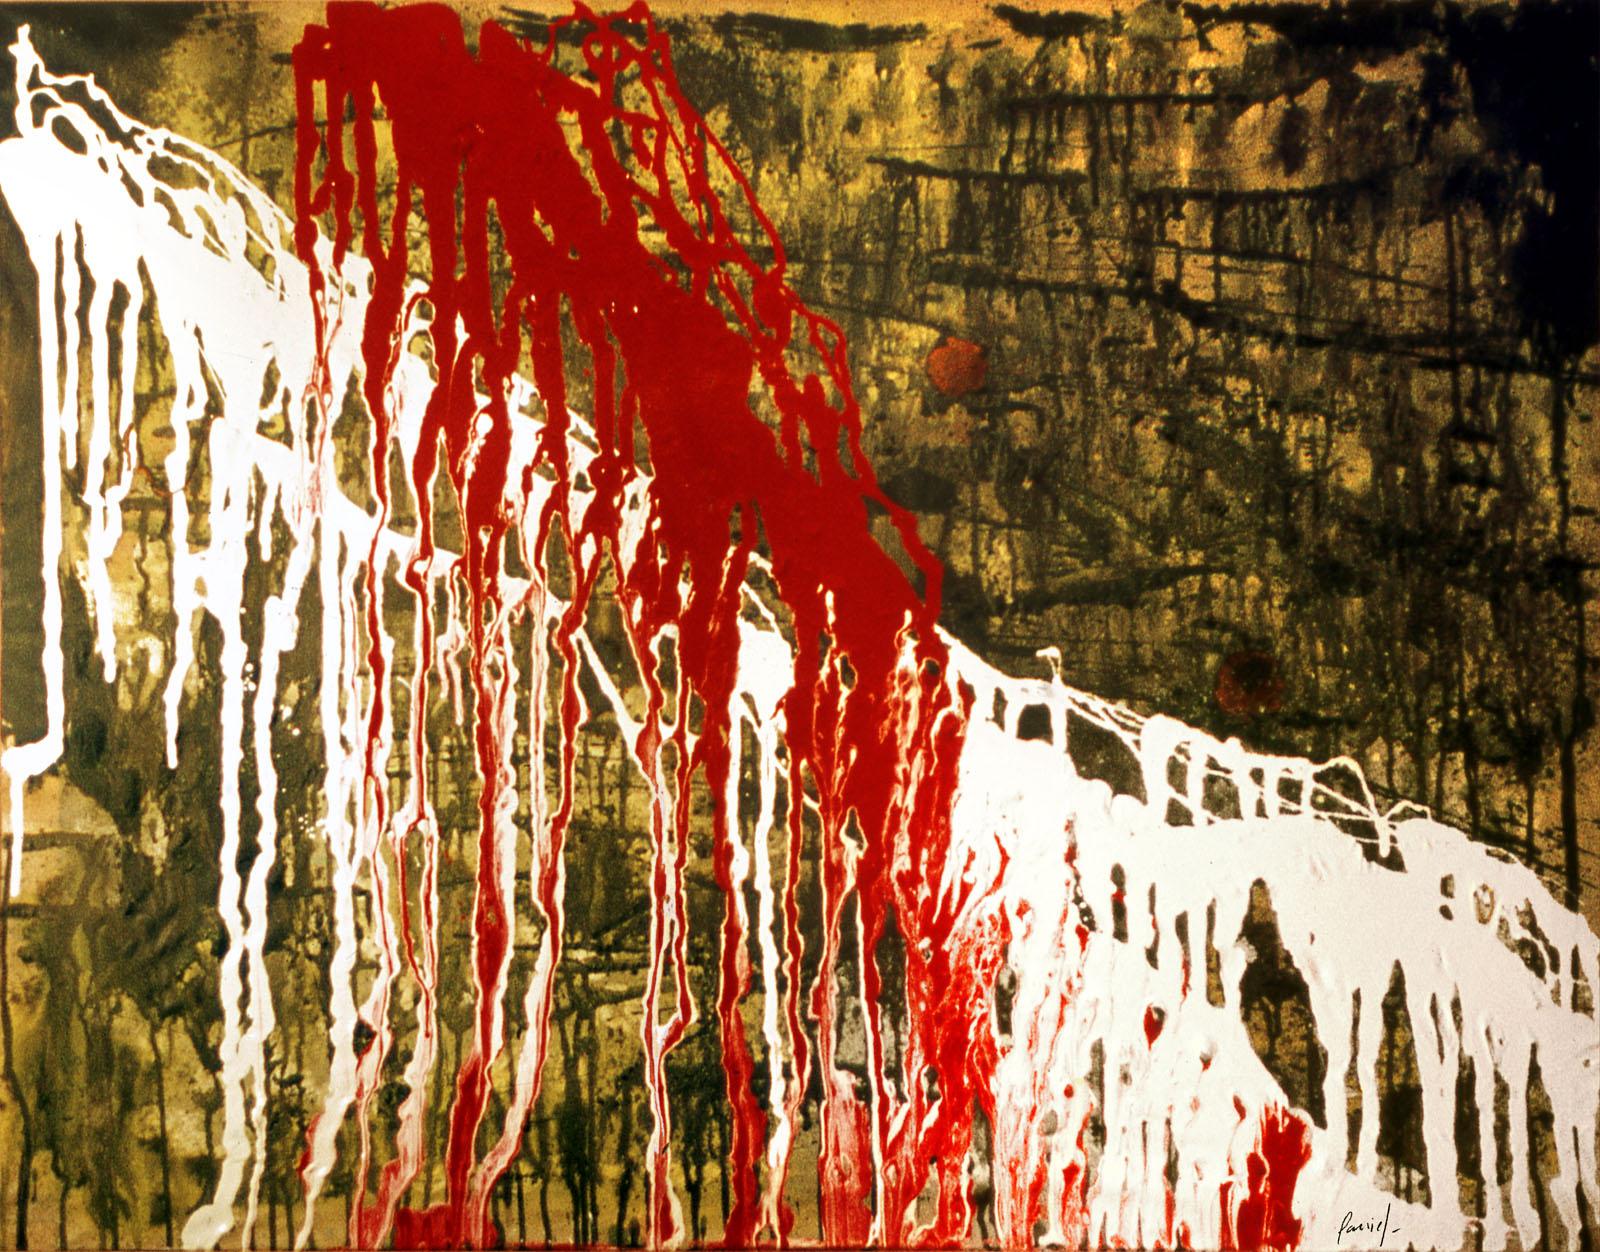 panies-danielvillalobos-spanish-painting-abstractexpressionism-4